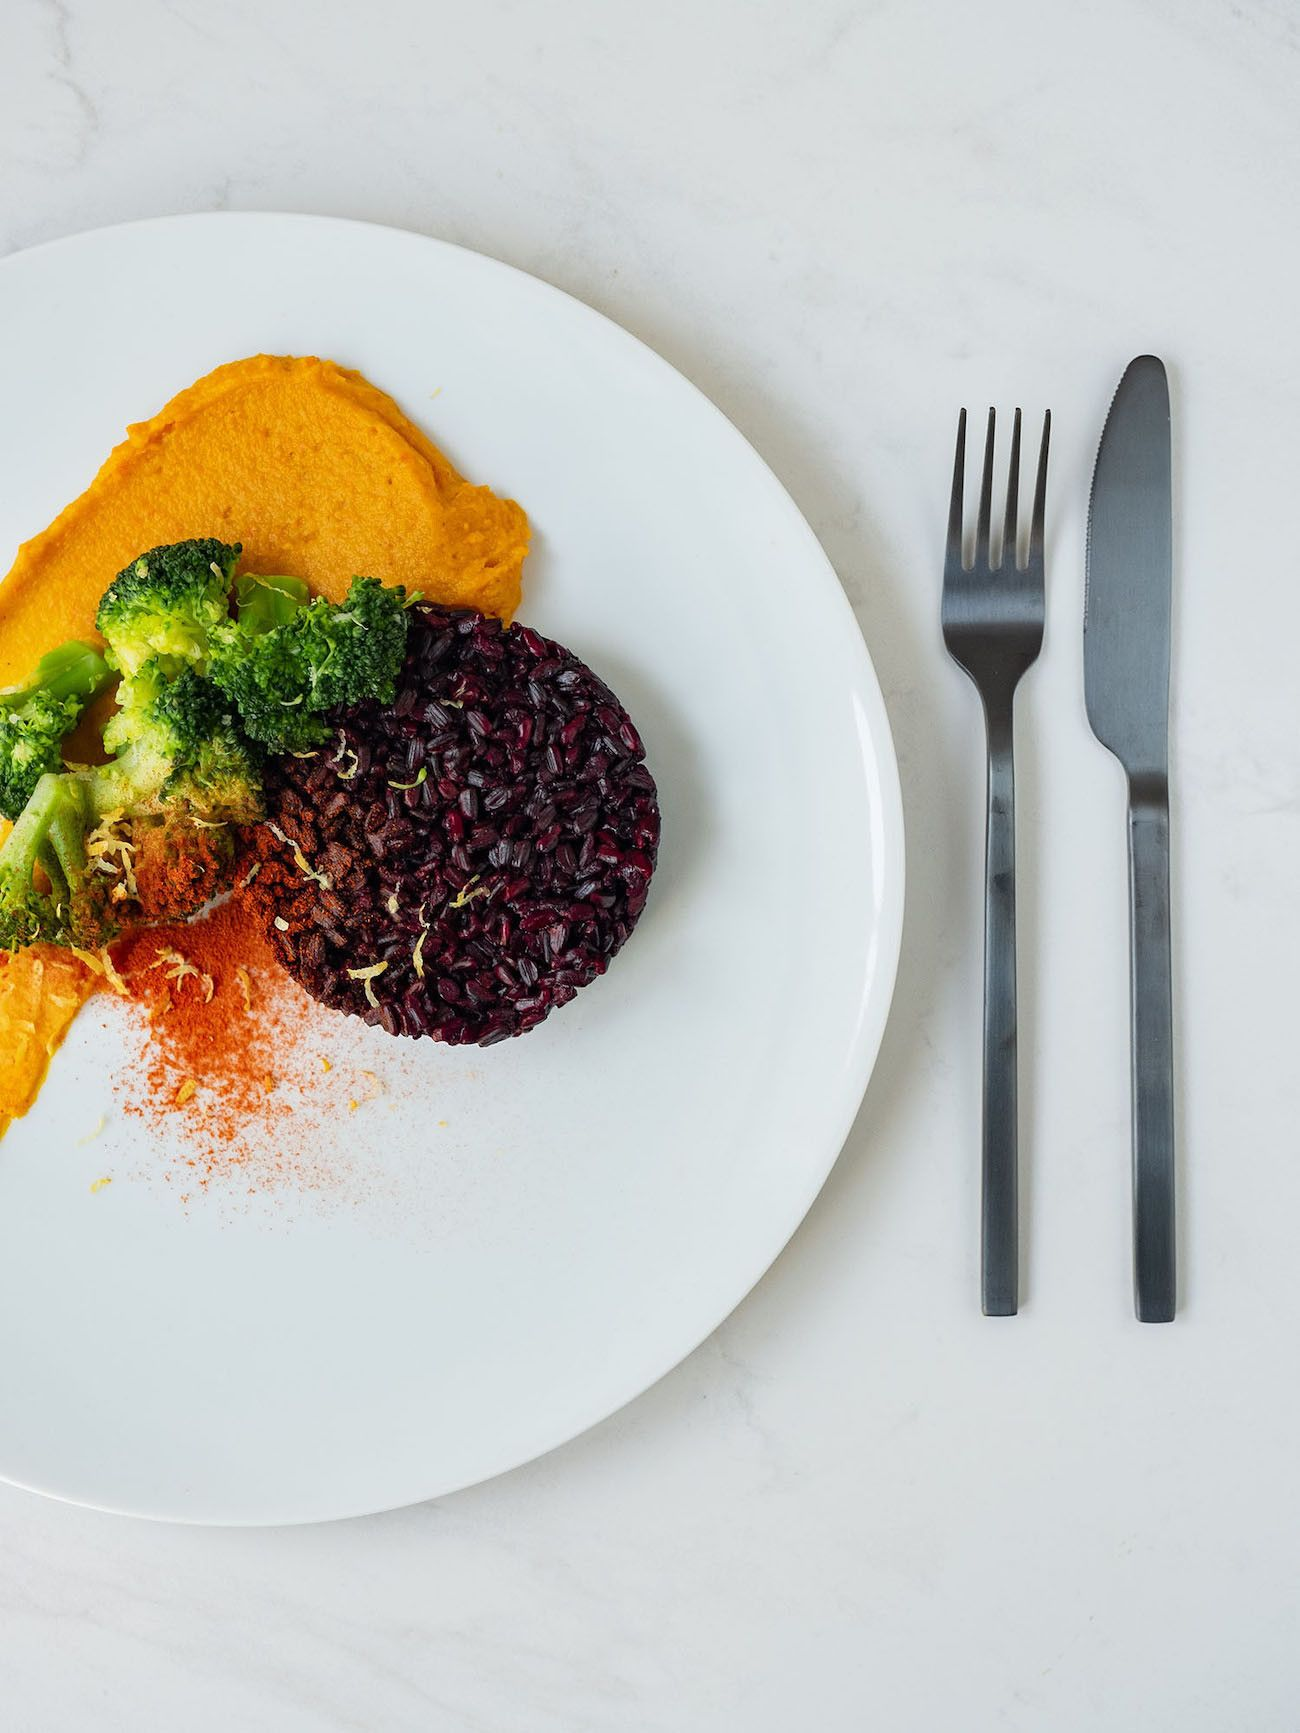 Foodblog, Rezept Kürbis Curry Püree mit zitronen Brokkoli und schwarzem Reis, Hokkaido, Paprikapulver_1